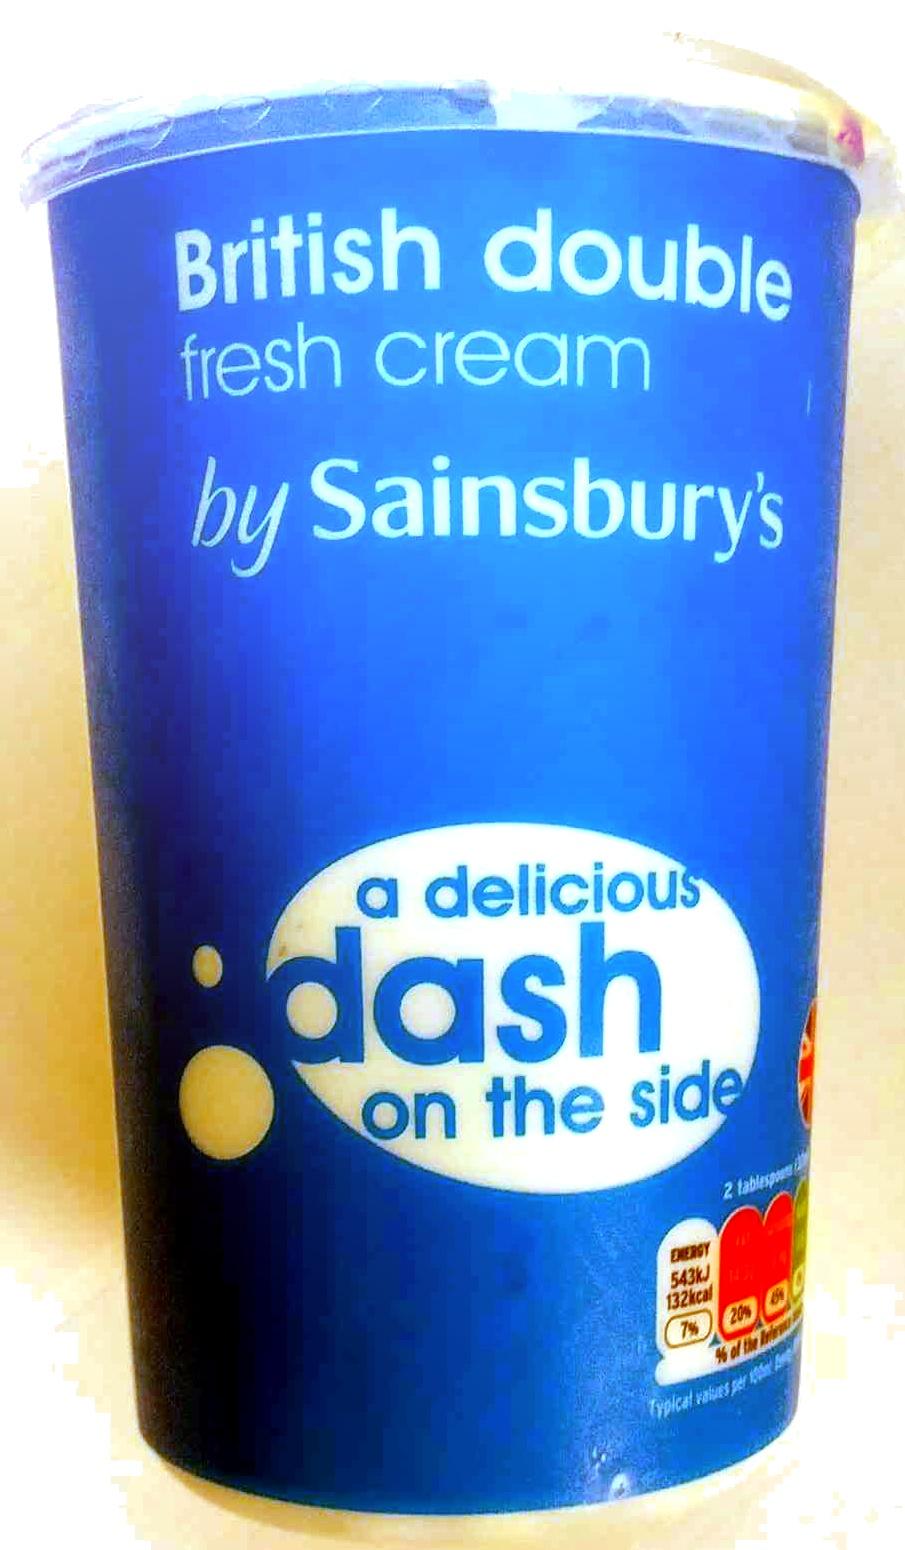 British double fresh cream - Product - en